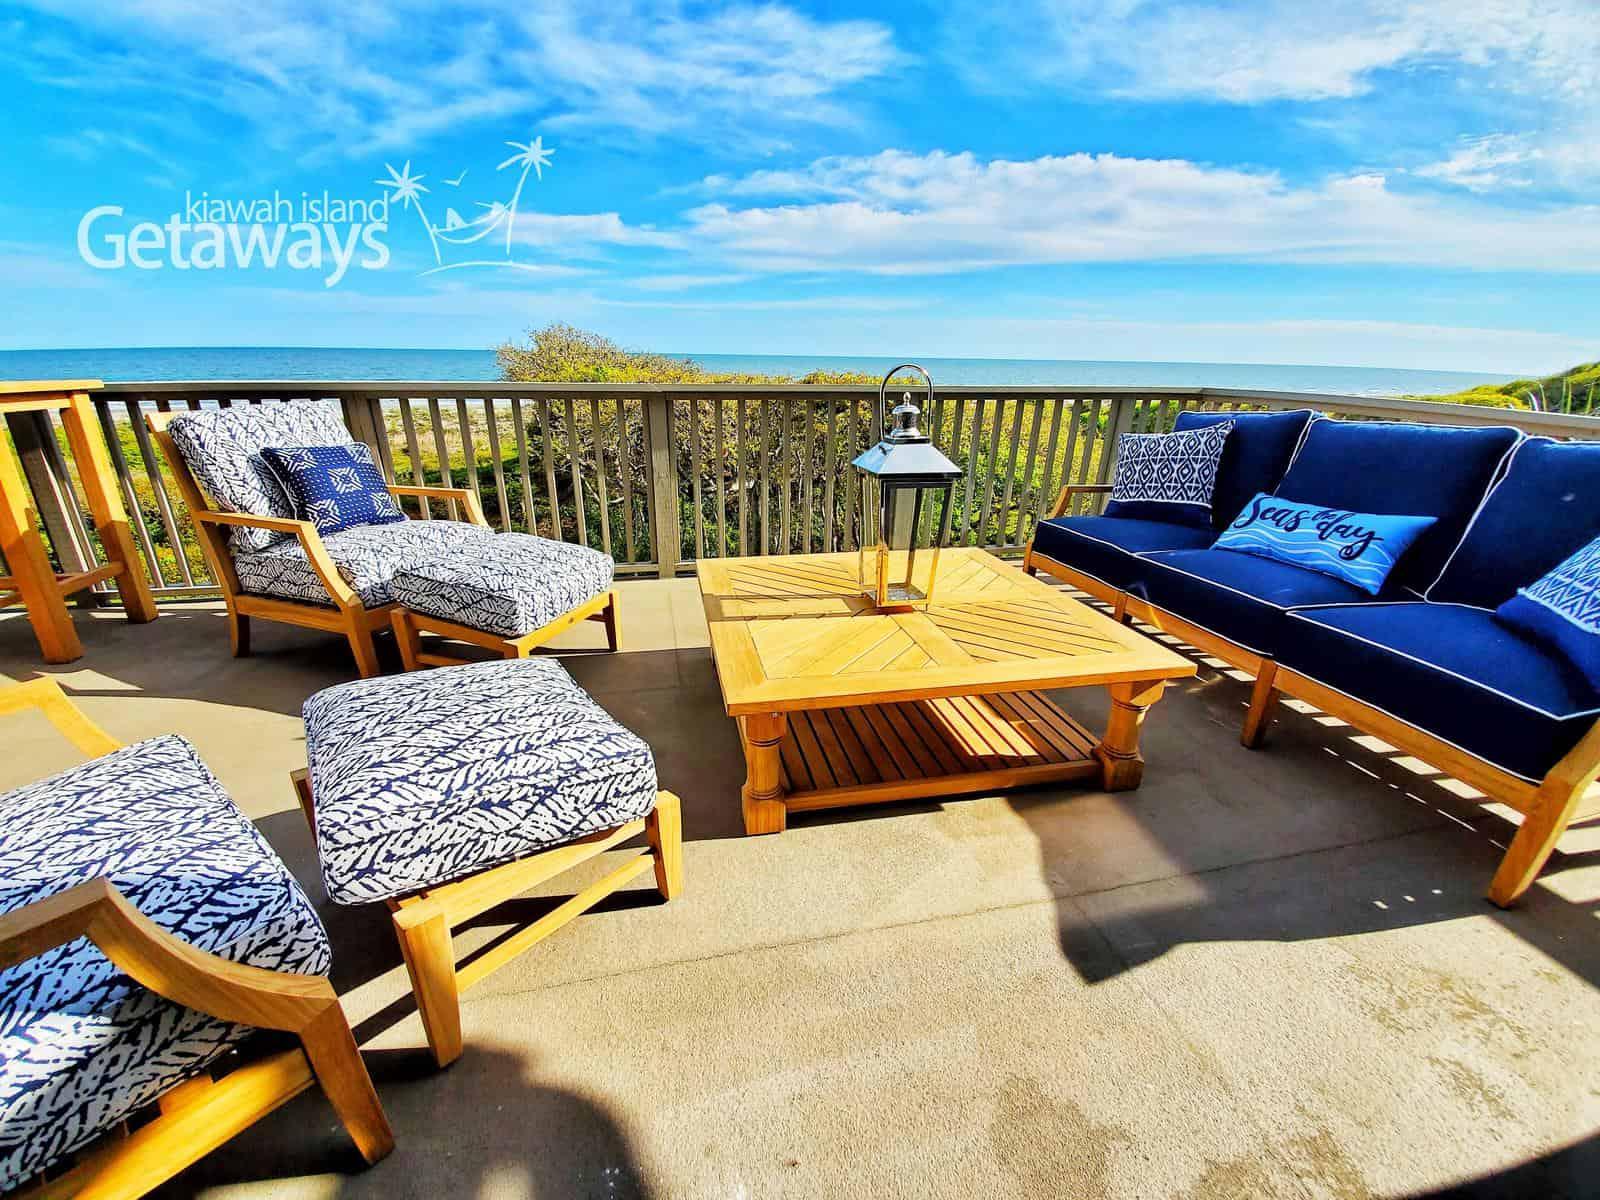 Long-term accommodations Kiawah Island